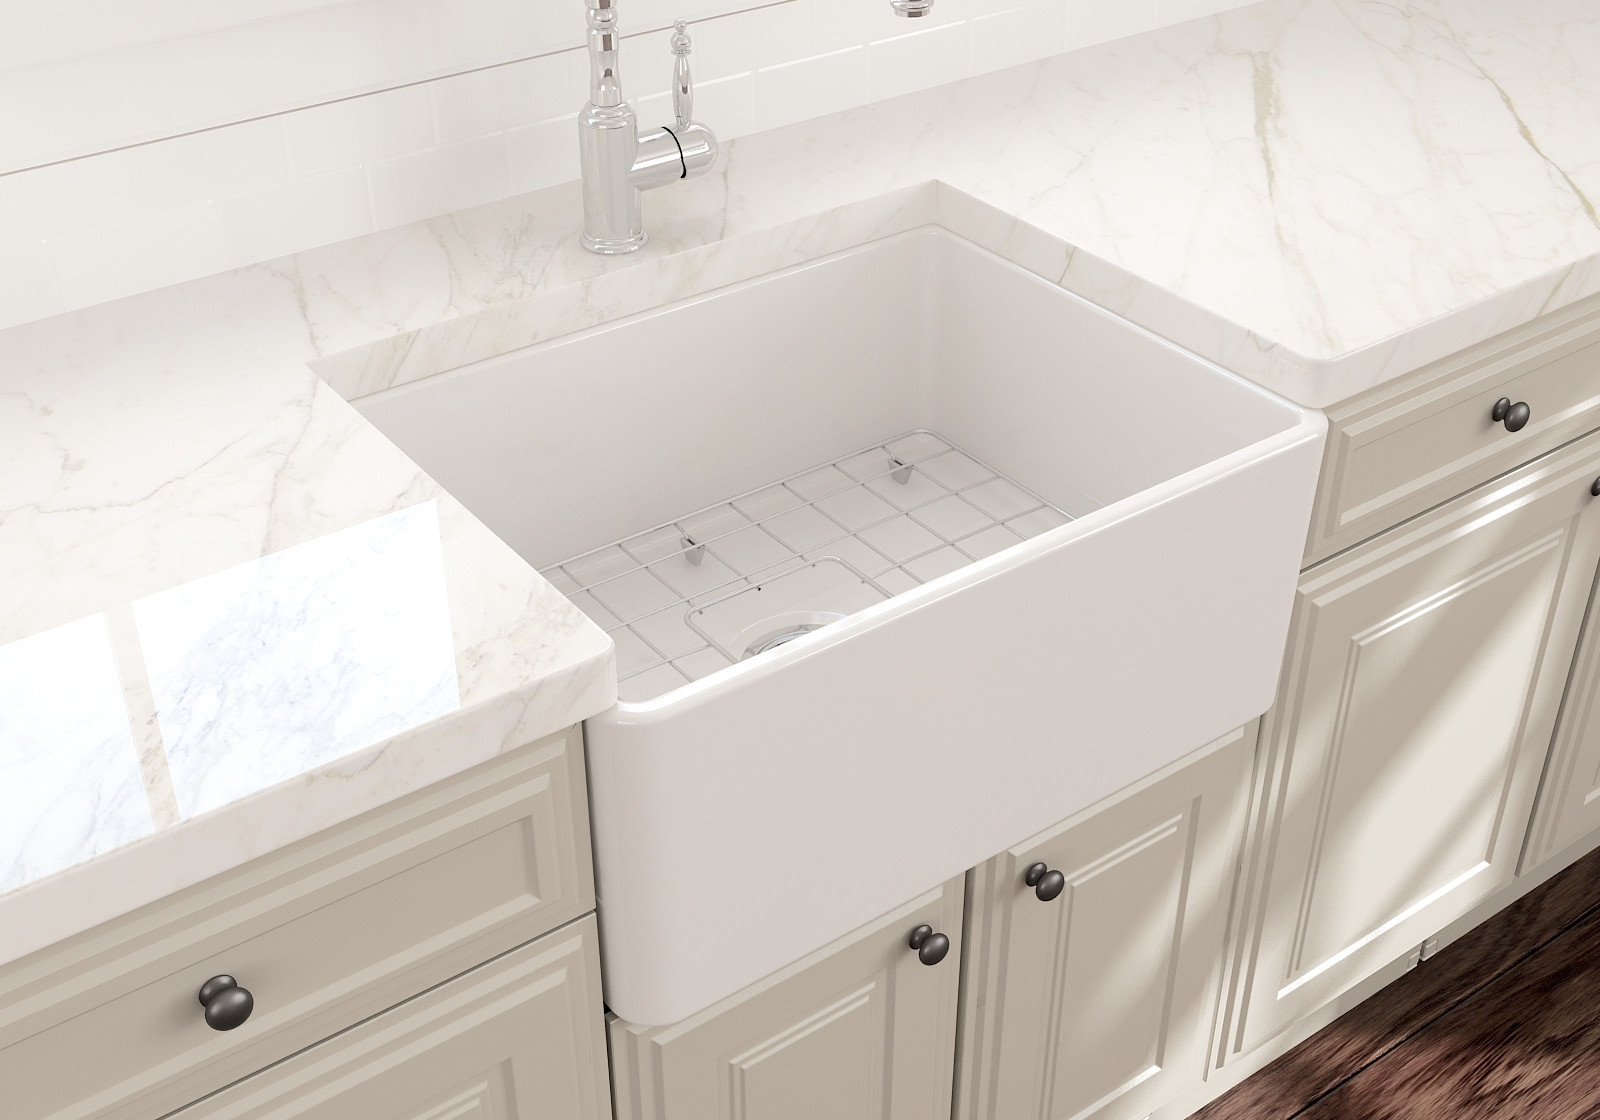 BOCCHI 1137-001-0120 Classico Single Kitchen Sink w/ Bottom Grid In White